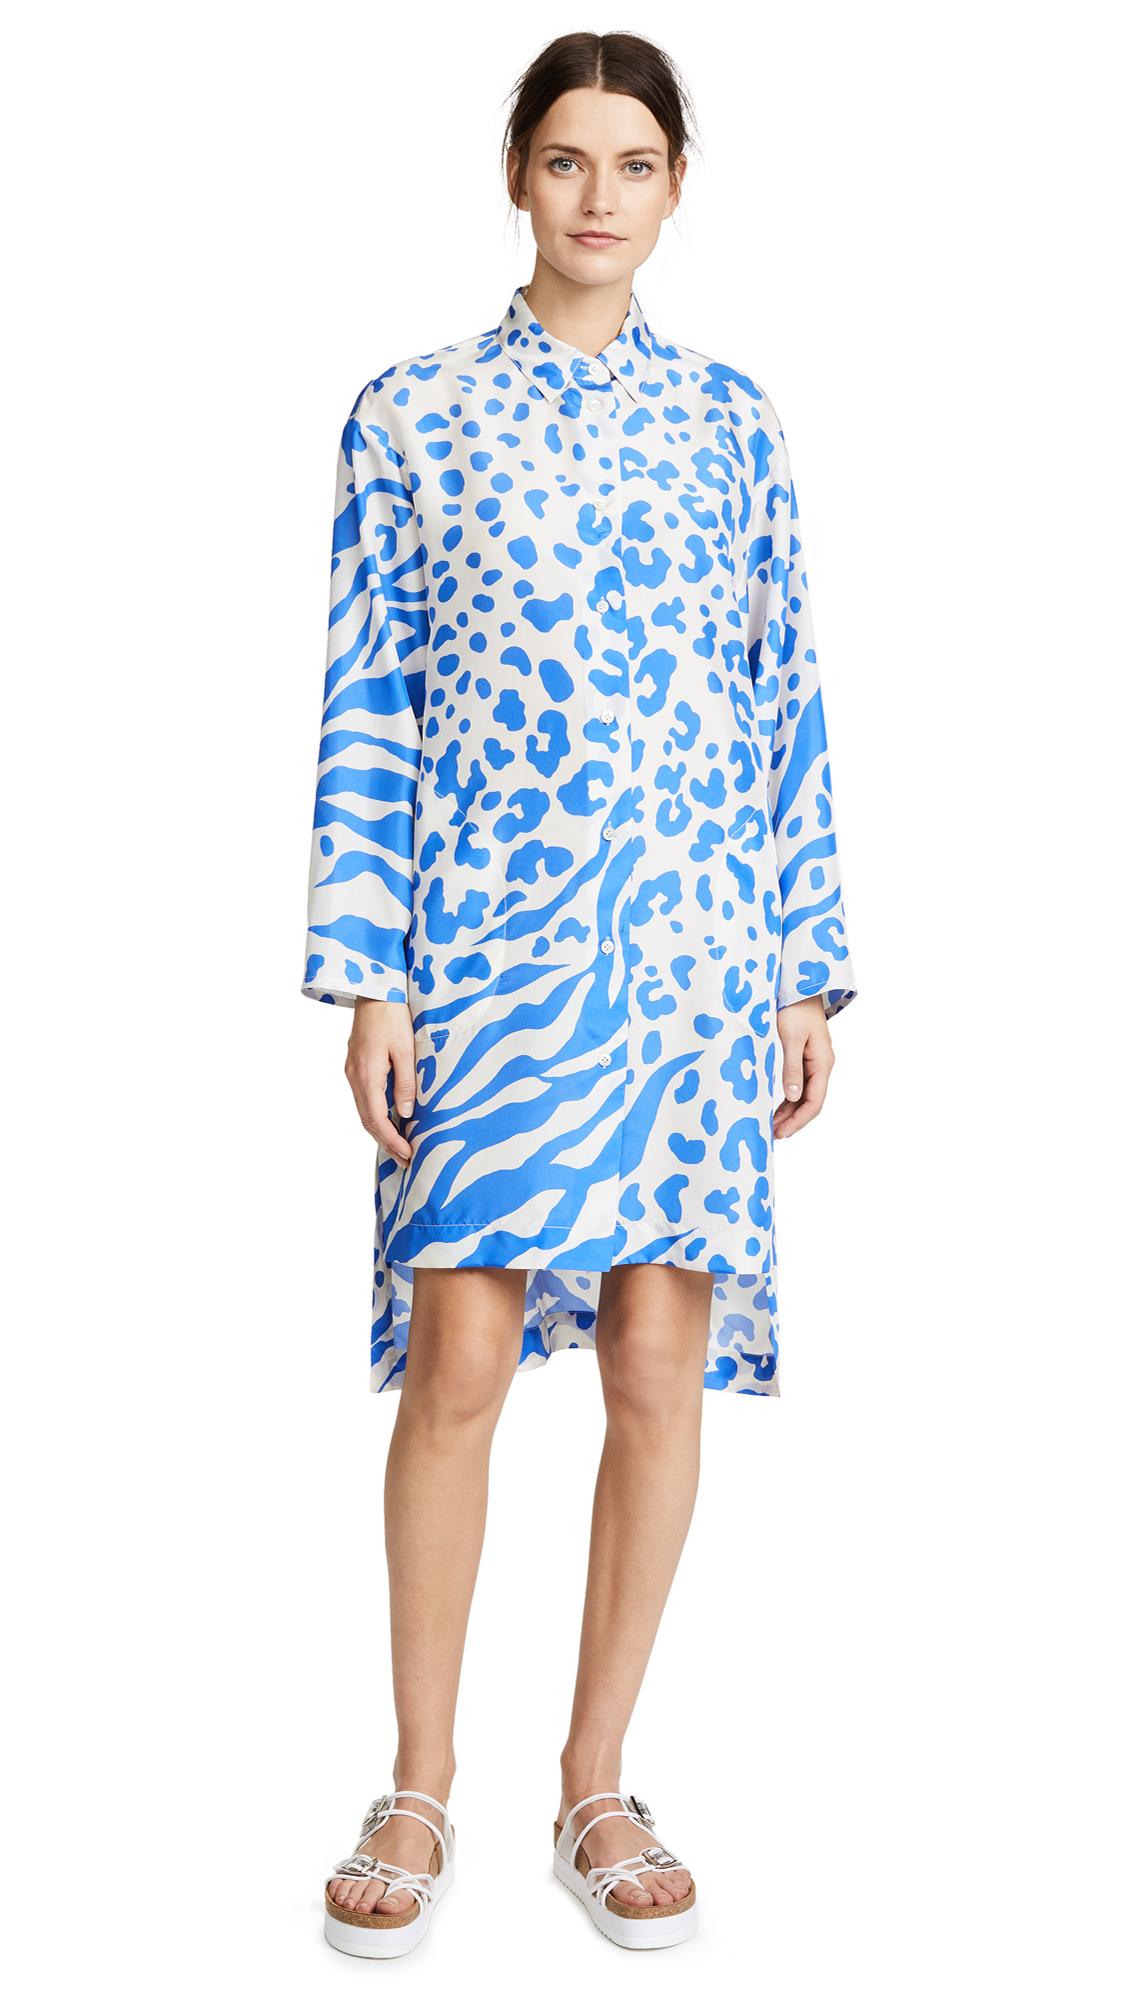 Acne Studios Jenia Silk Dress